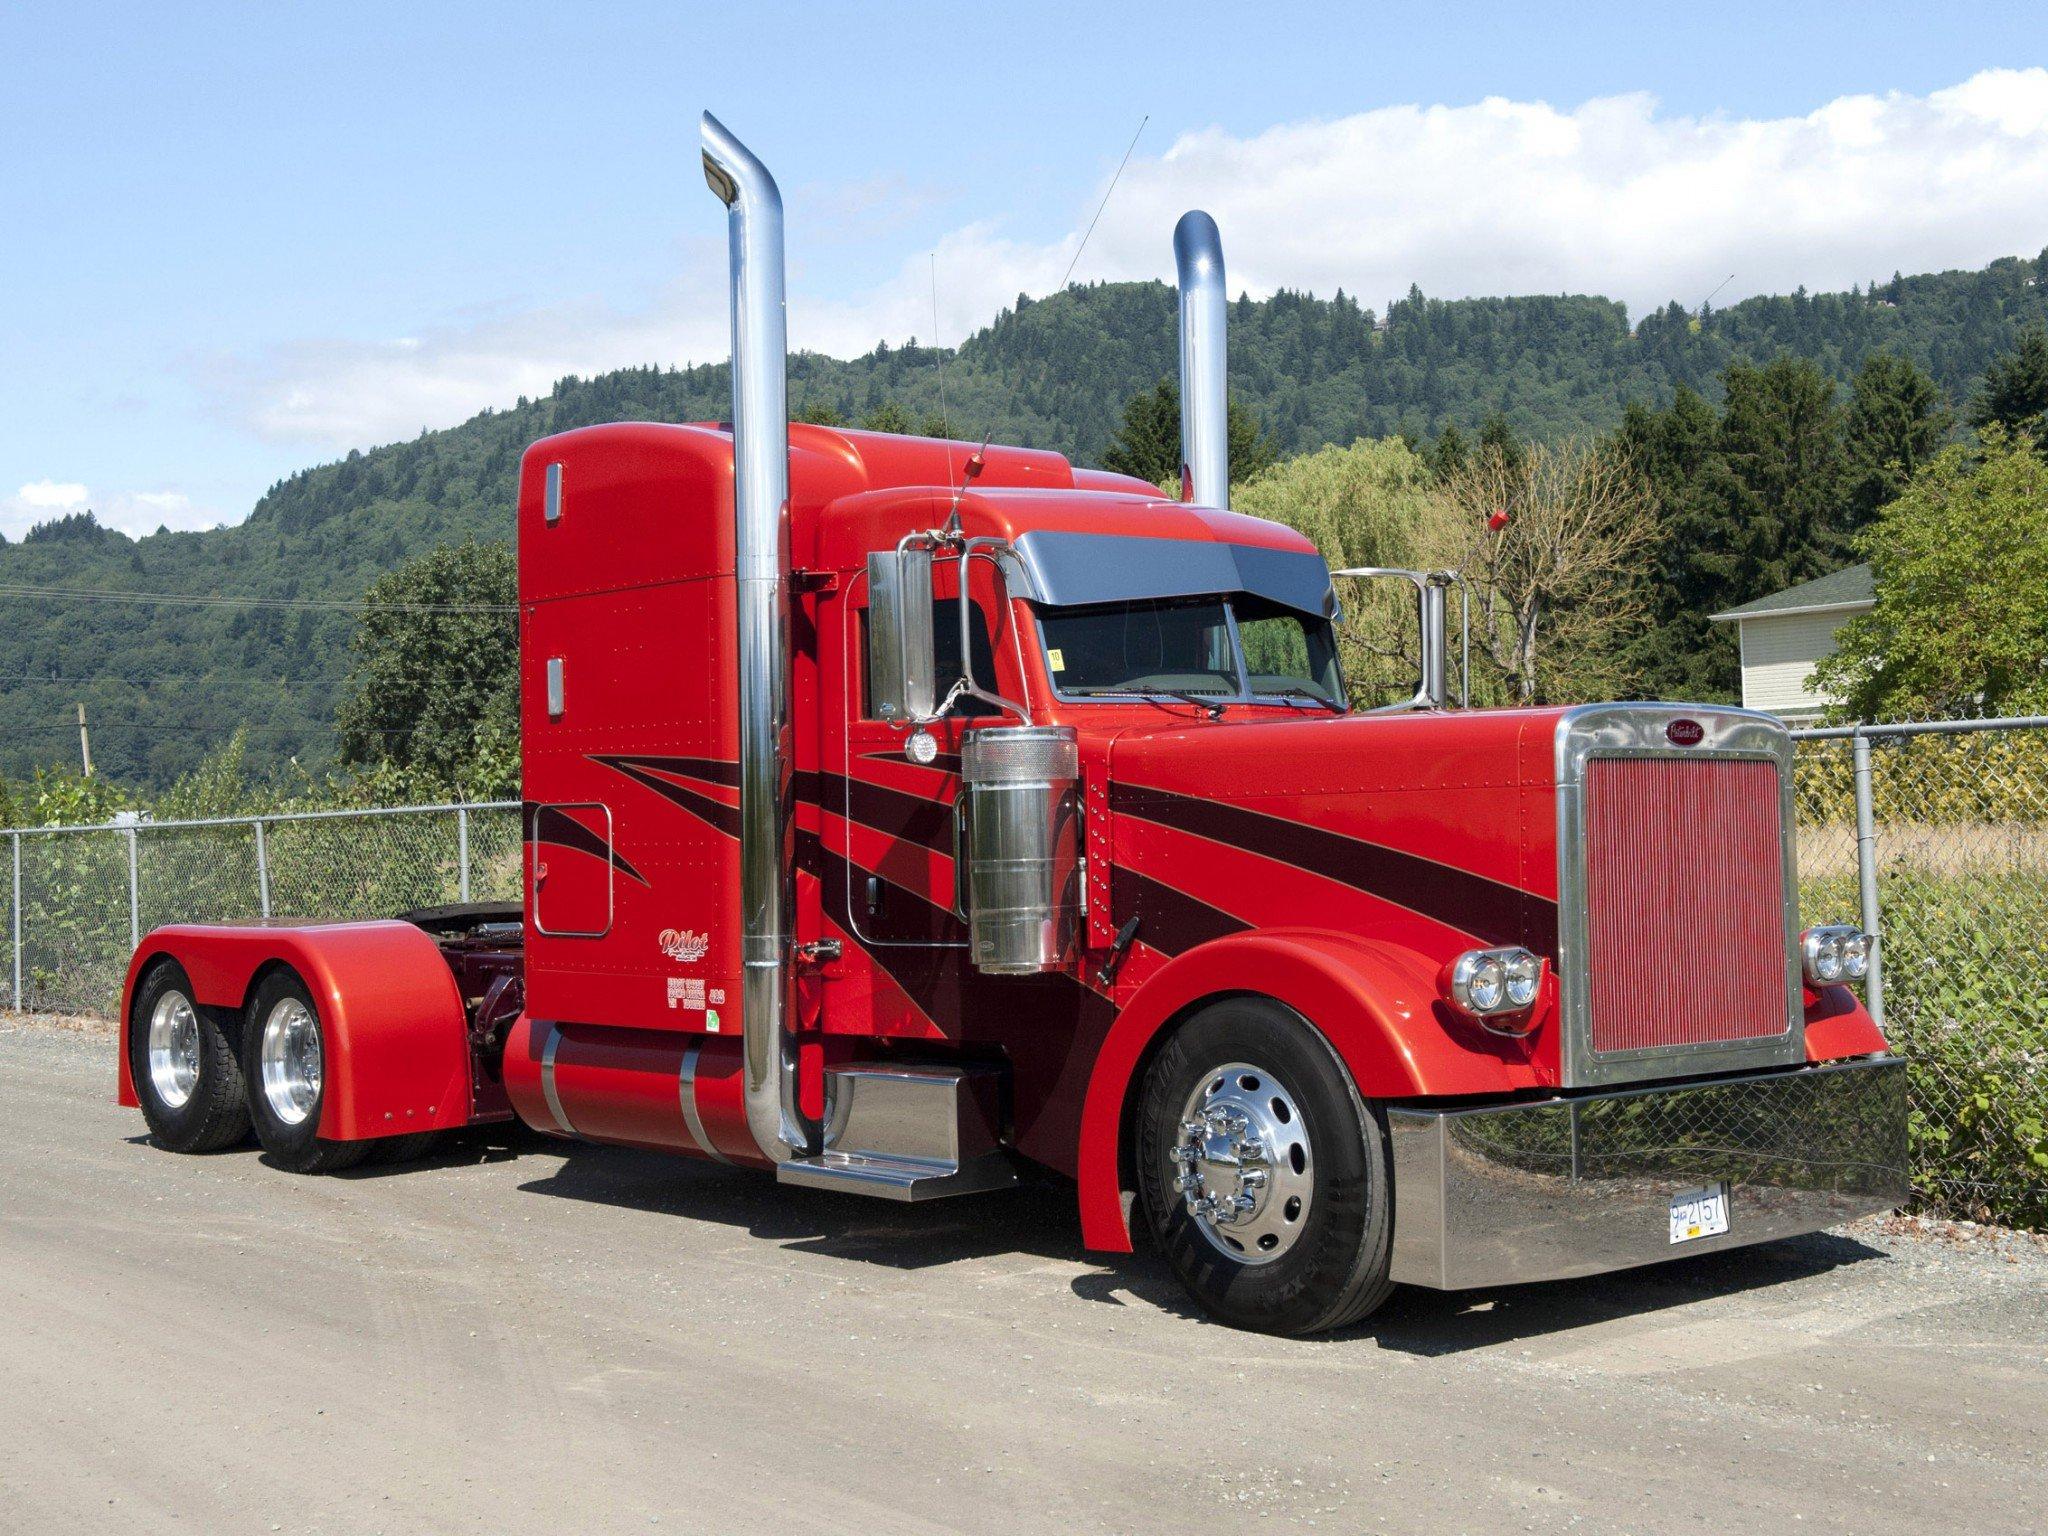 peterbilt semi tractor transport truck wallpaper 2048x1536 776436 wallpaperup. Black Bedroom Furniture Sets. Home Design Ideas